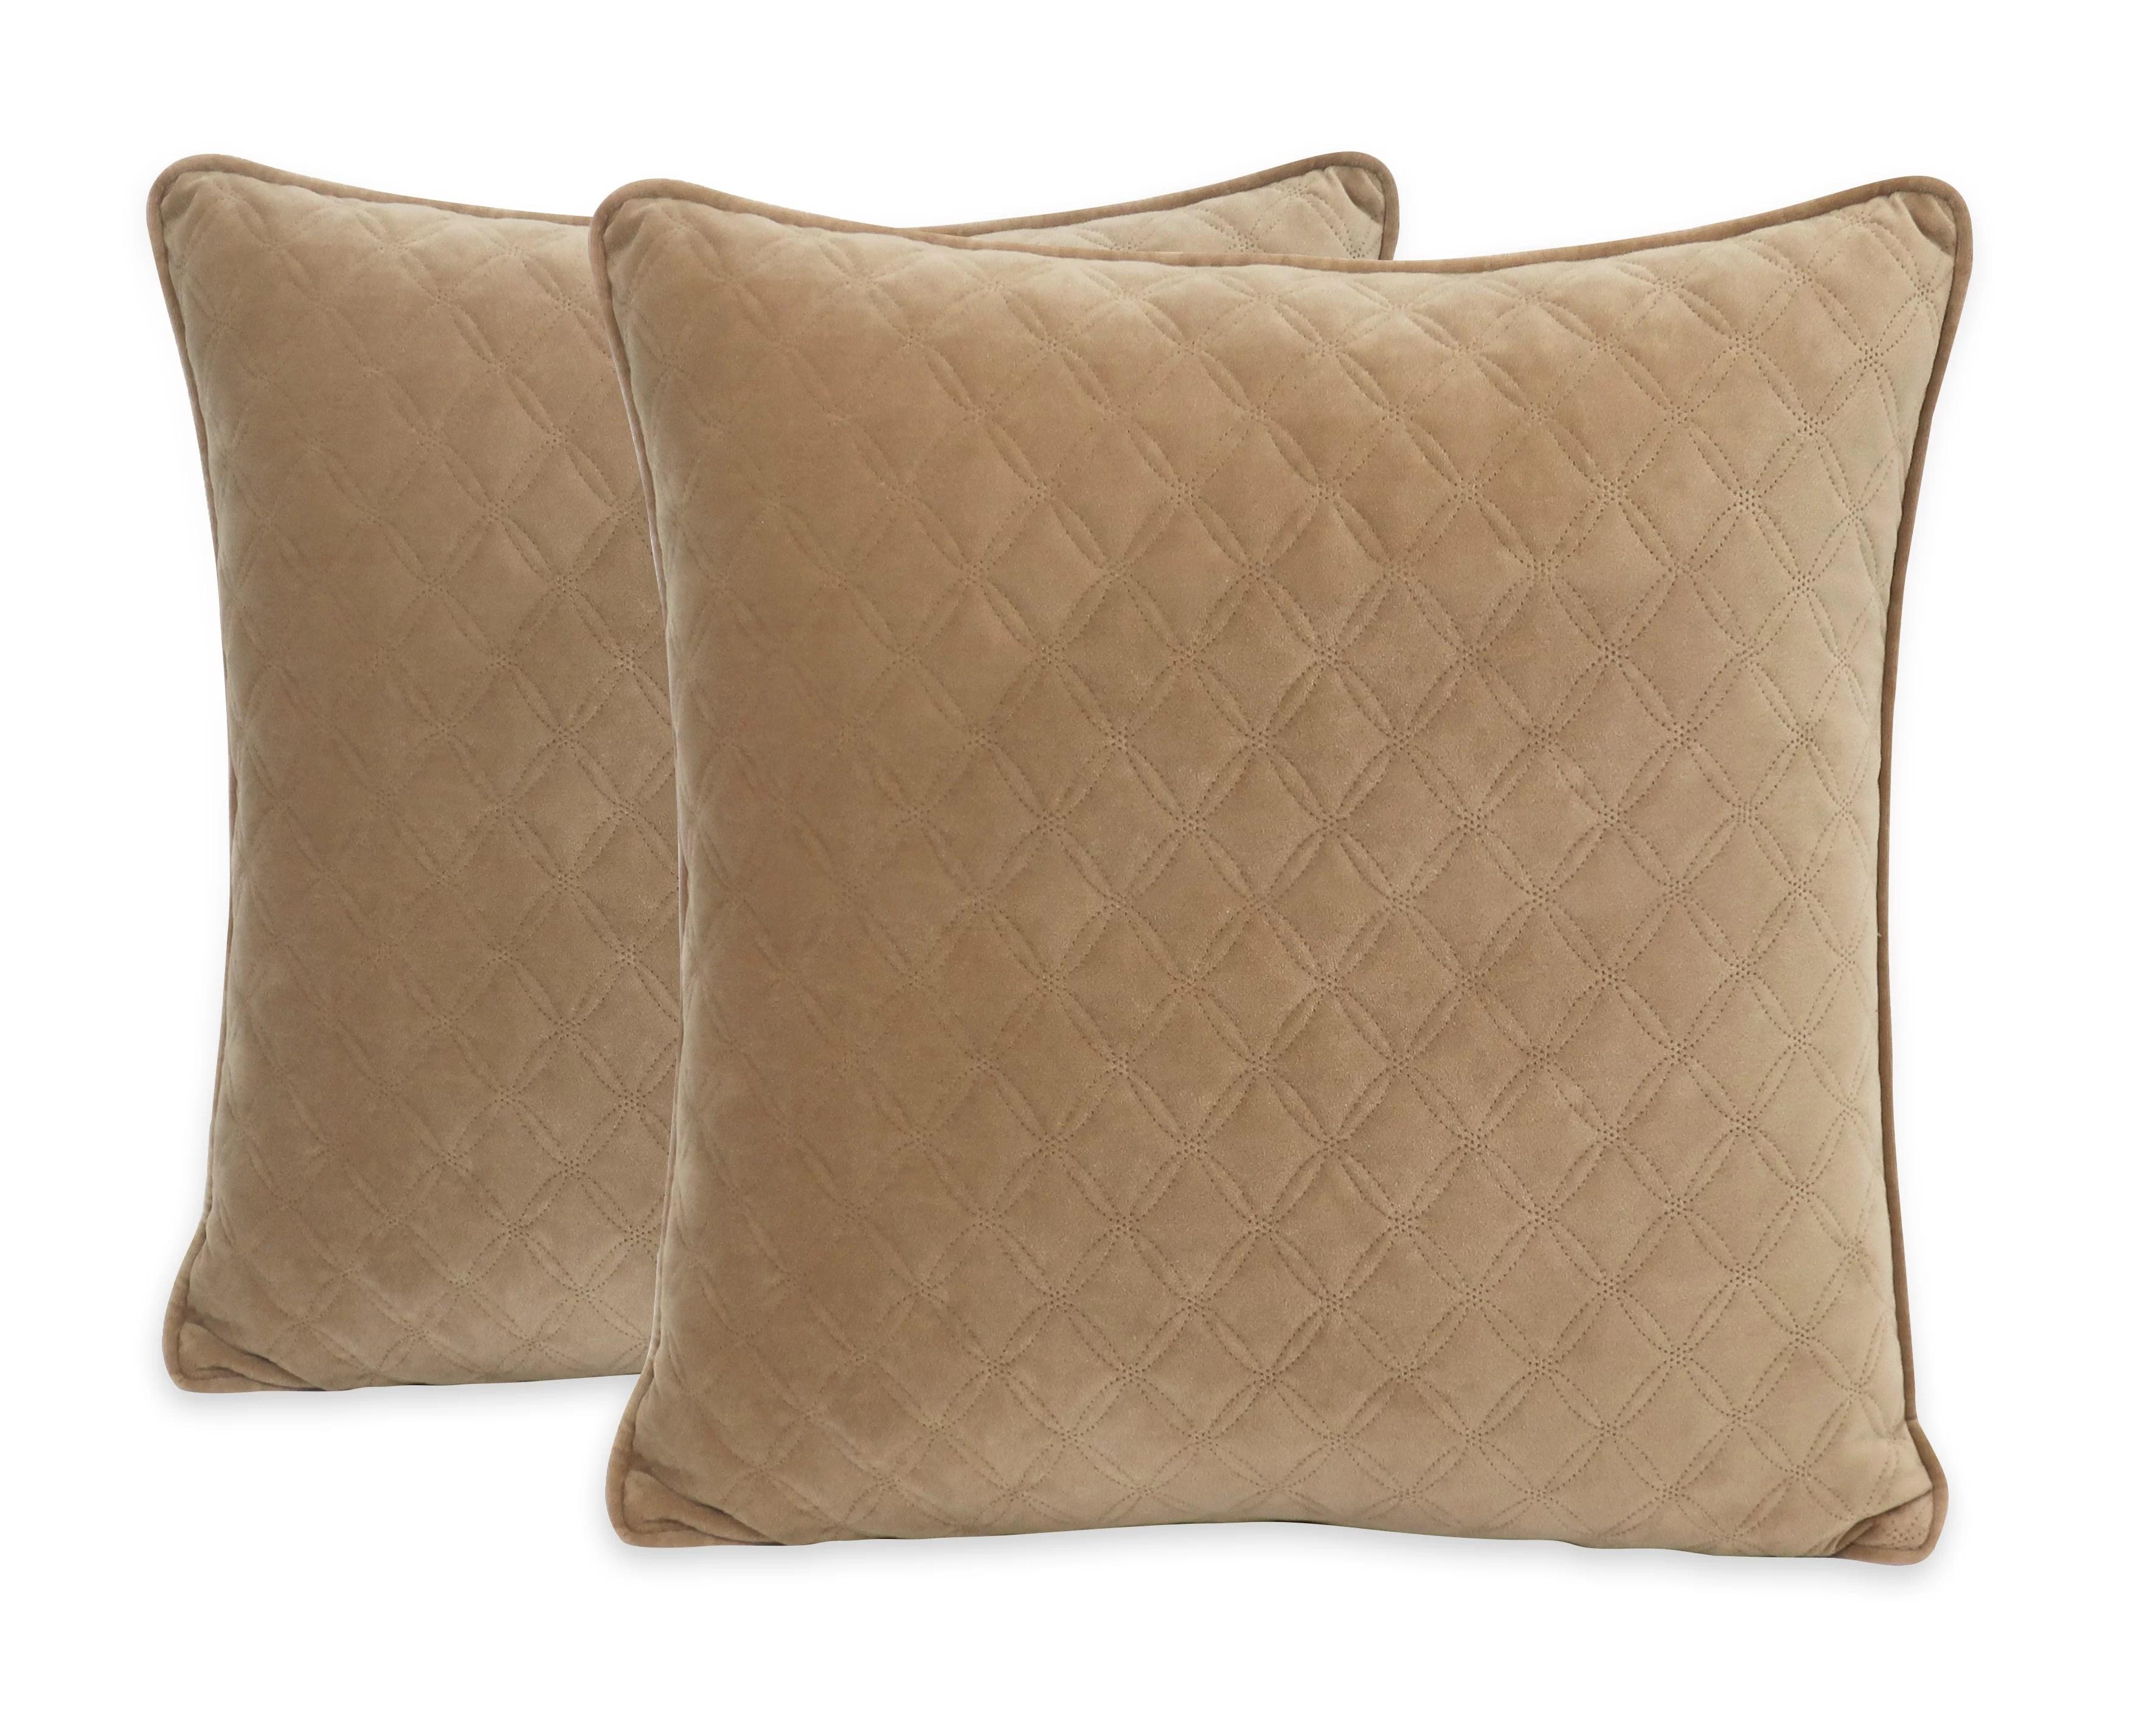 better homes gardens quilted look throw pillows 19 x 19 2 pack tan walmart com